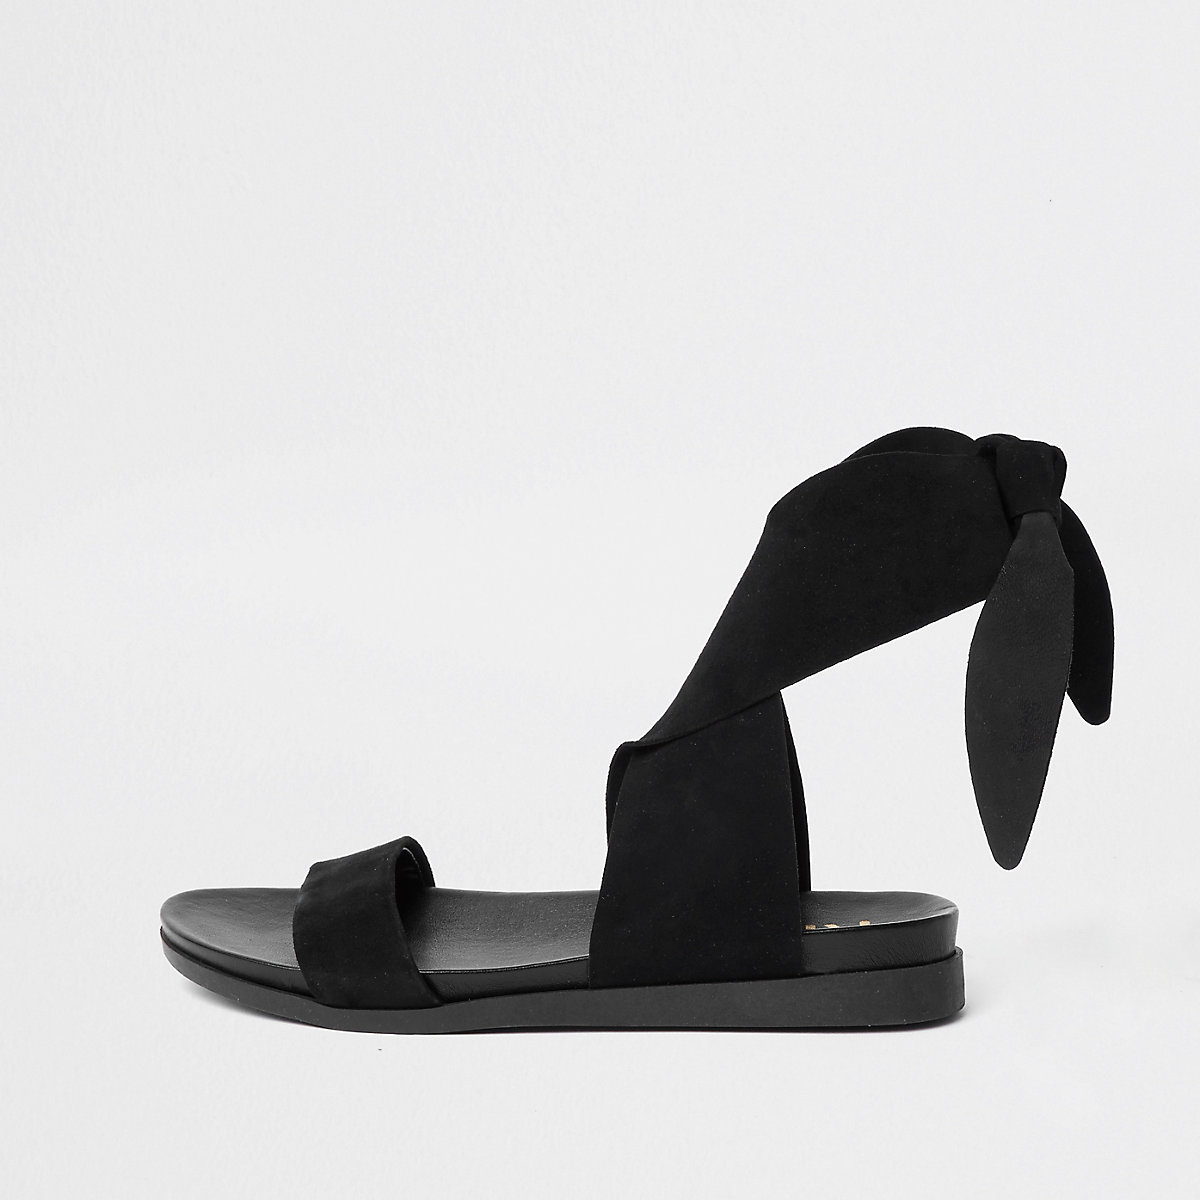 Black suede tie up sandals